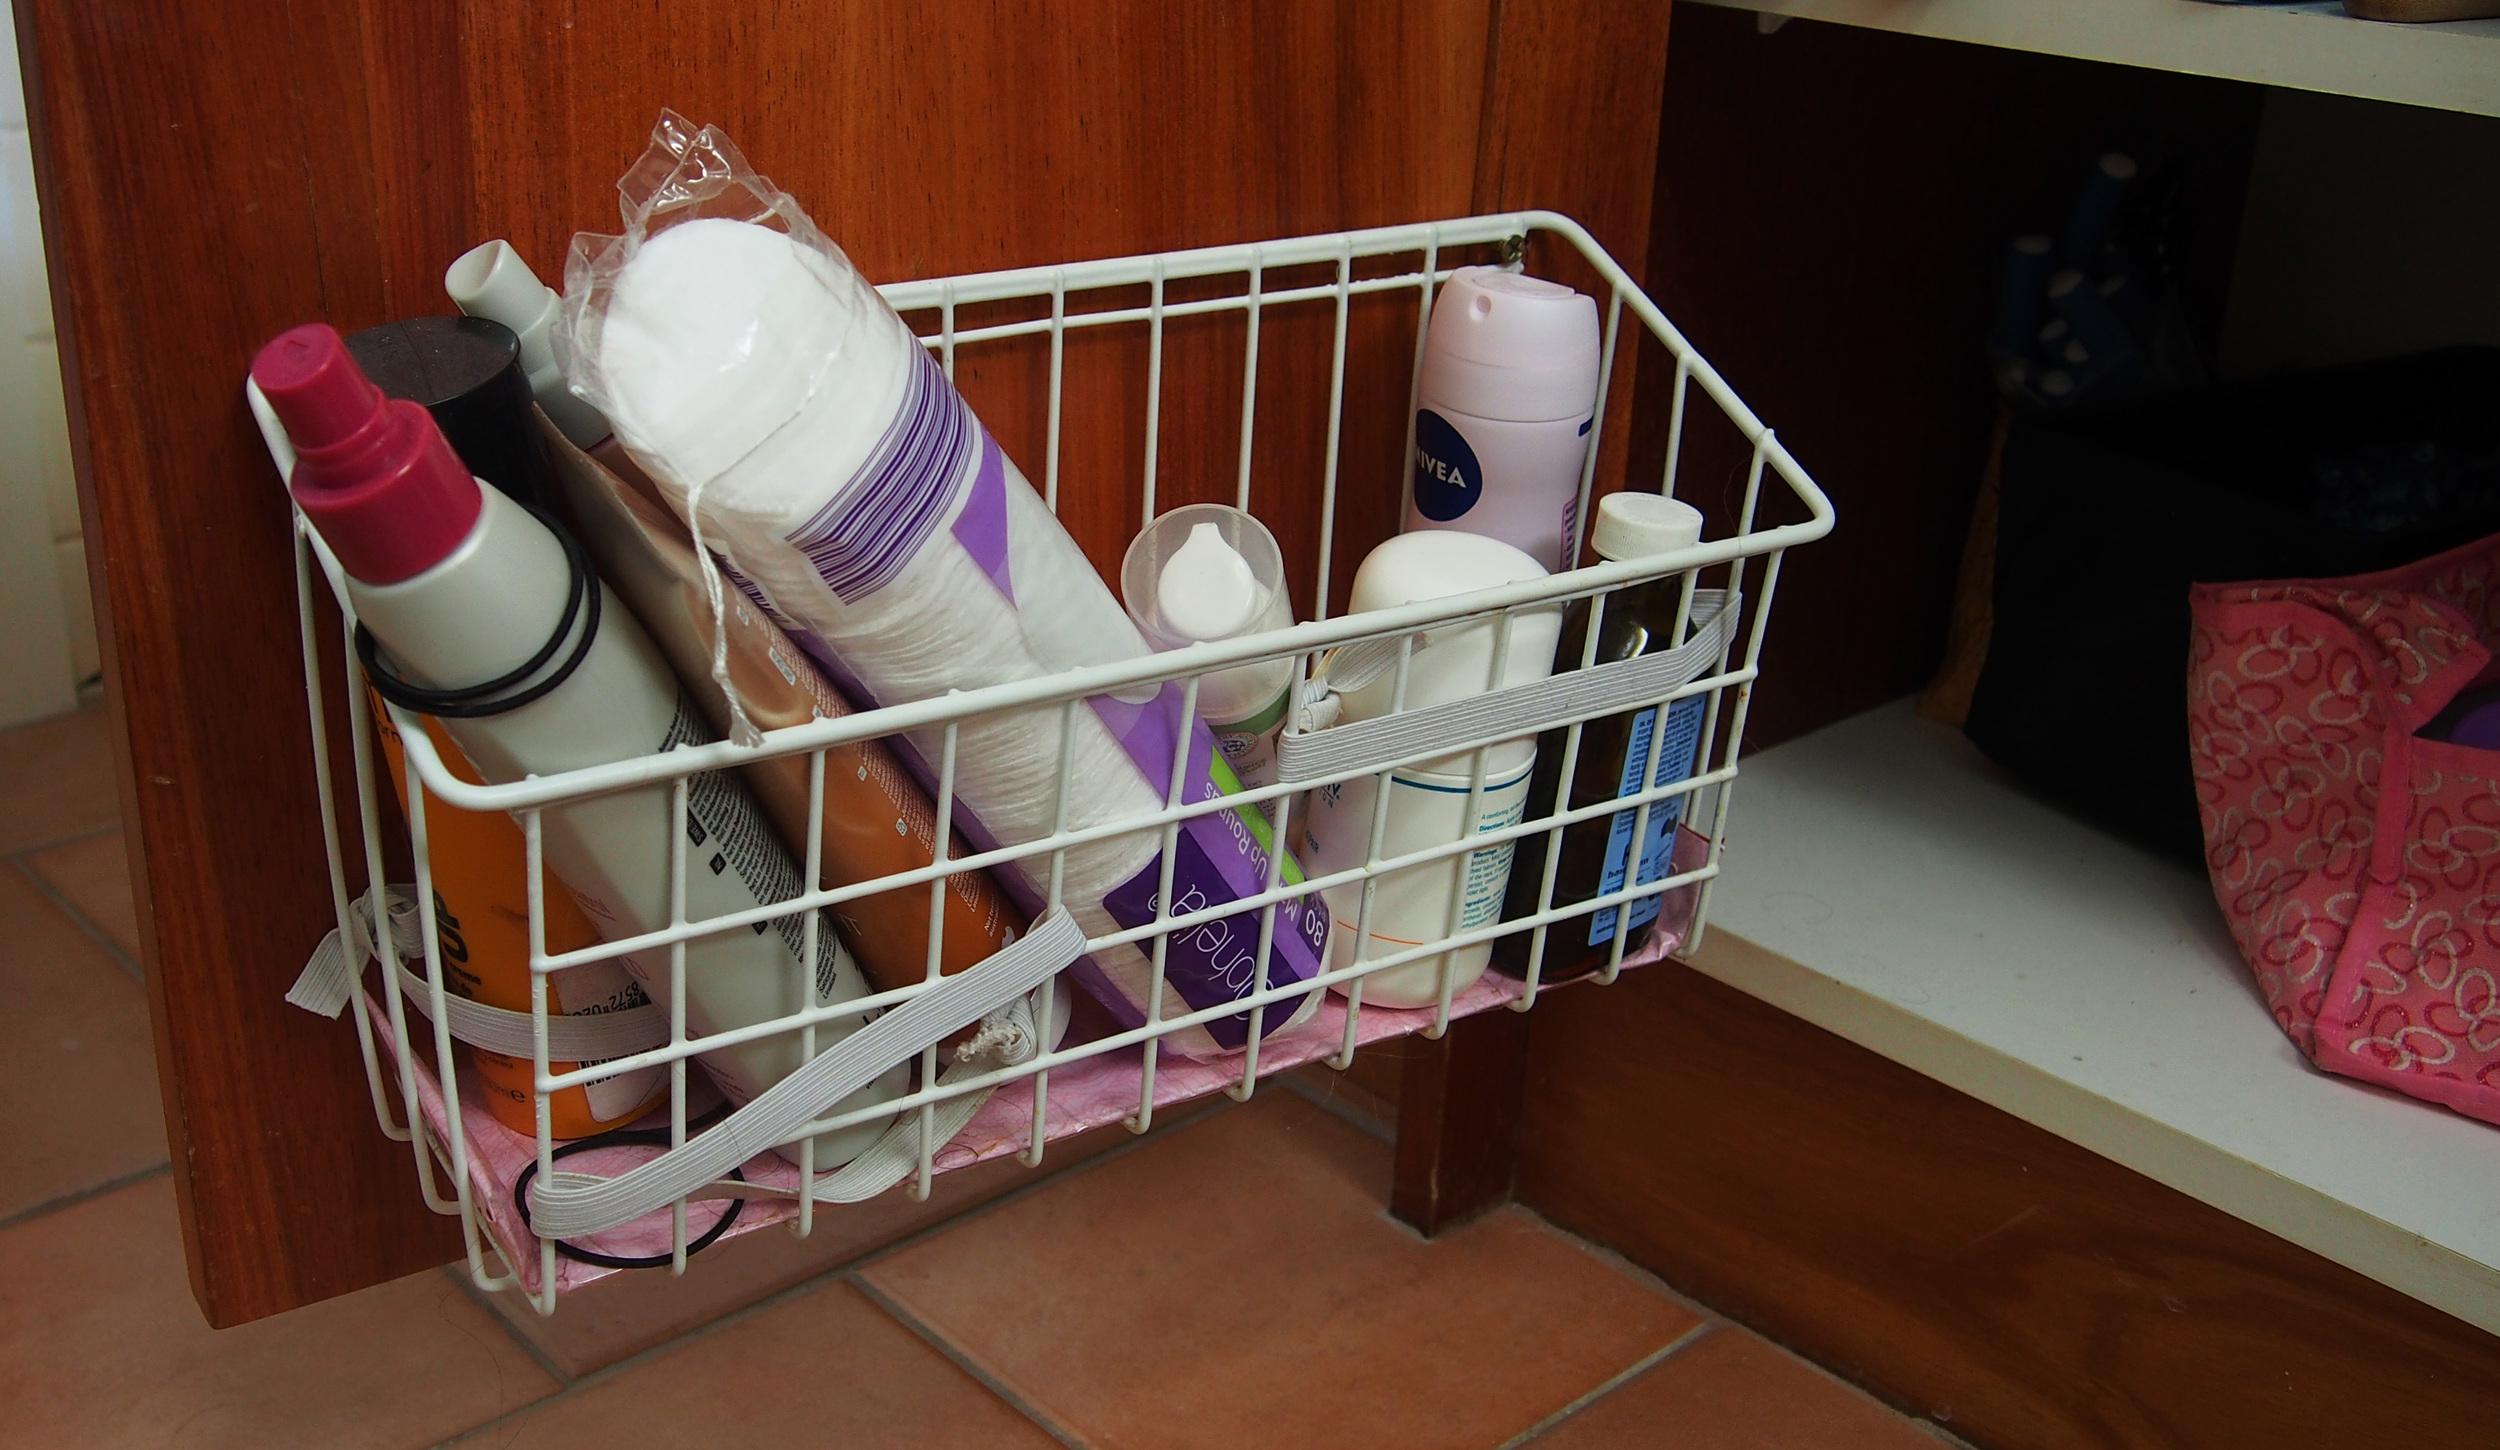 disorganised beauty supplies